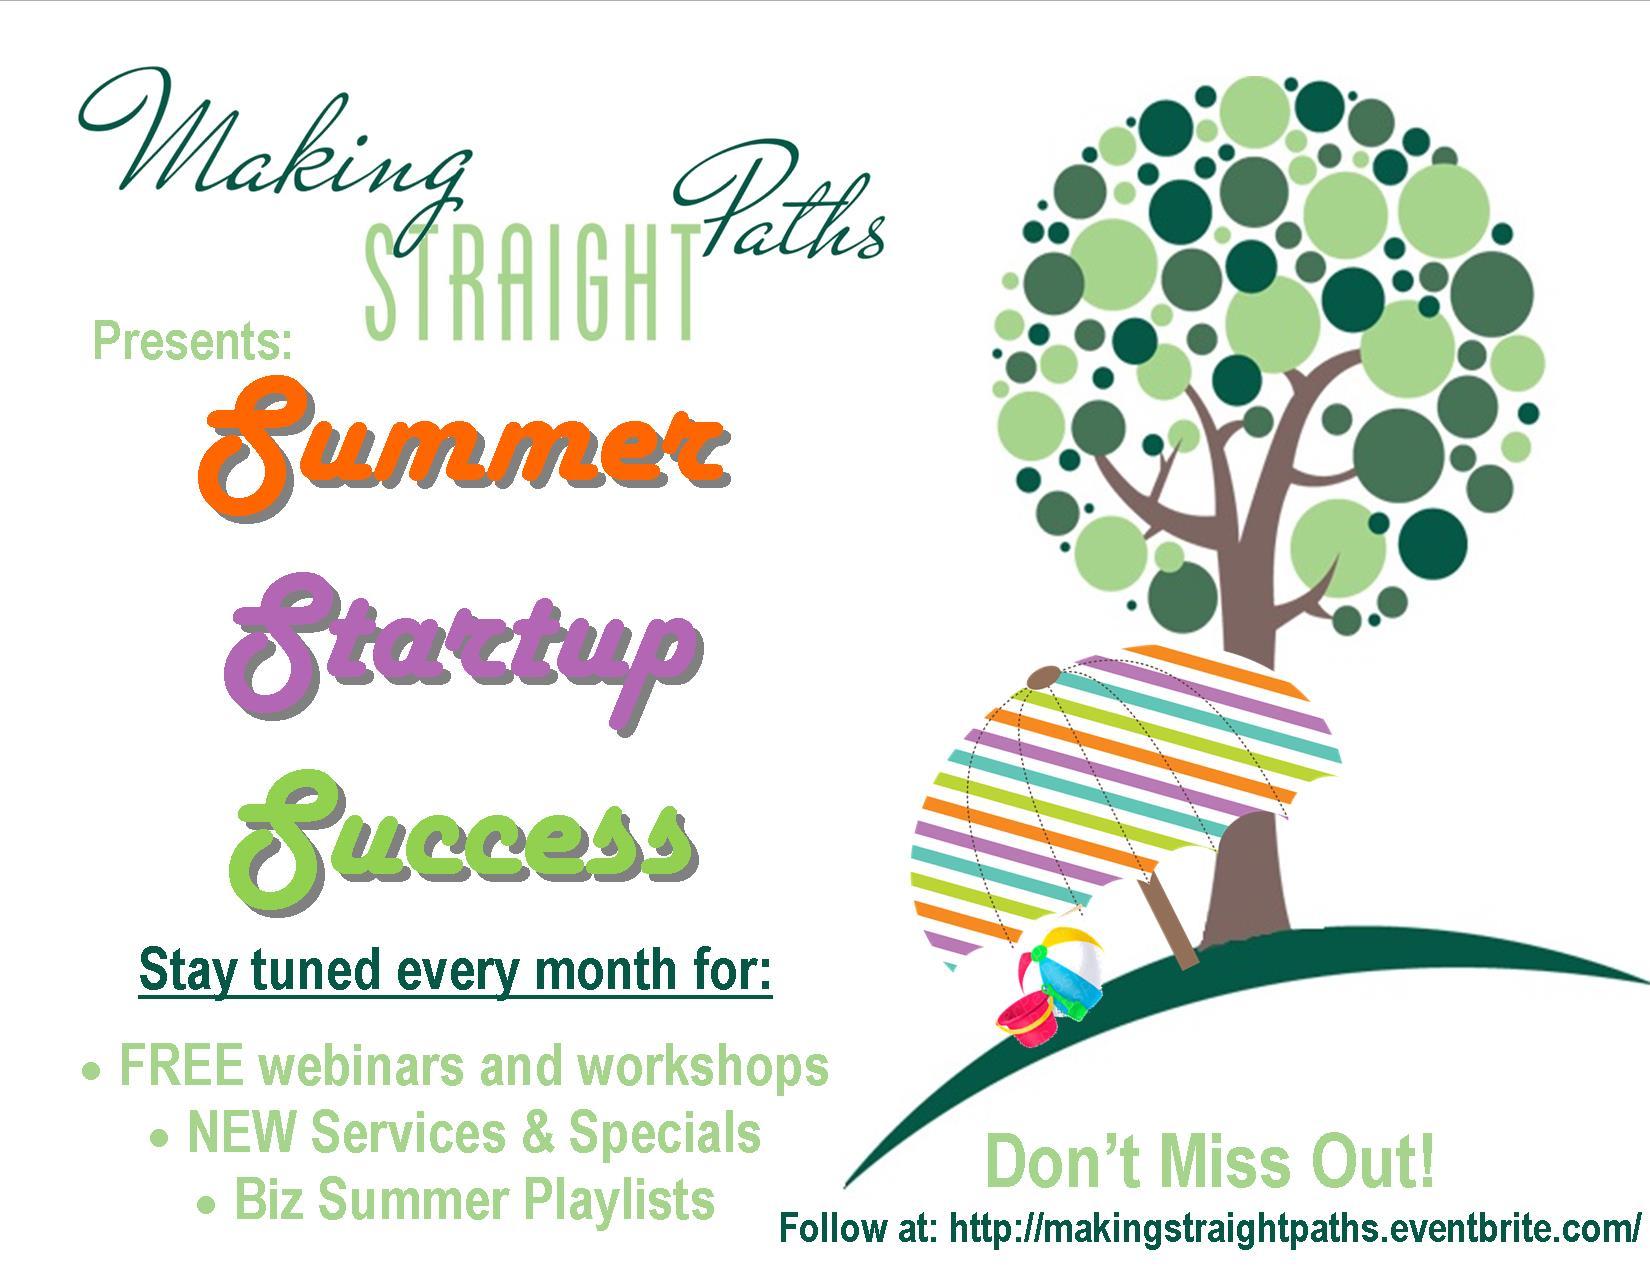 Summer Startup Success (2015_07_17 03_55_04 UTC).jpg